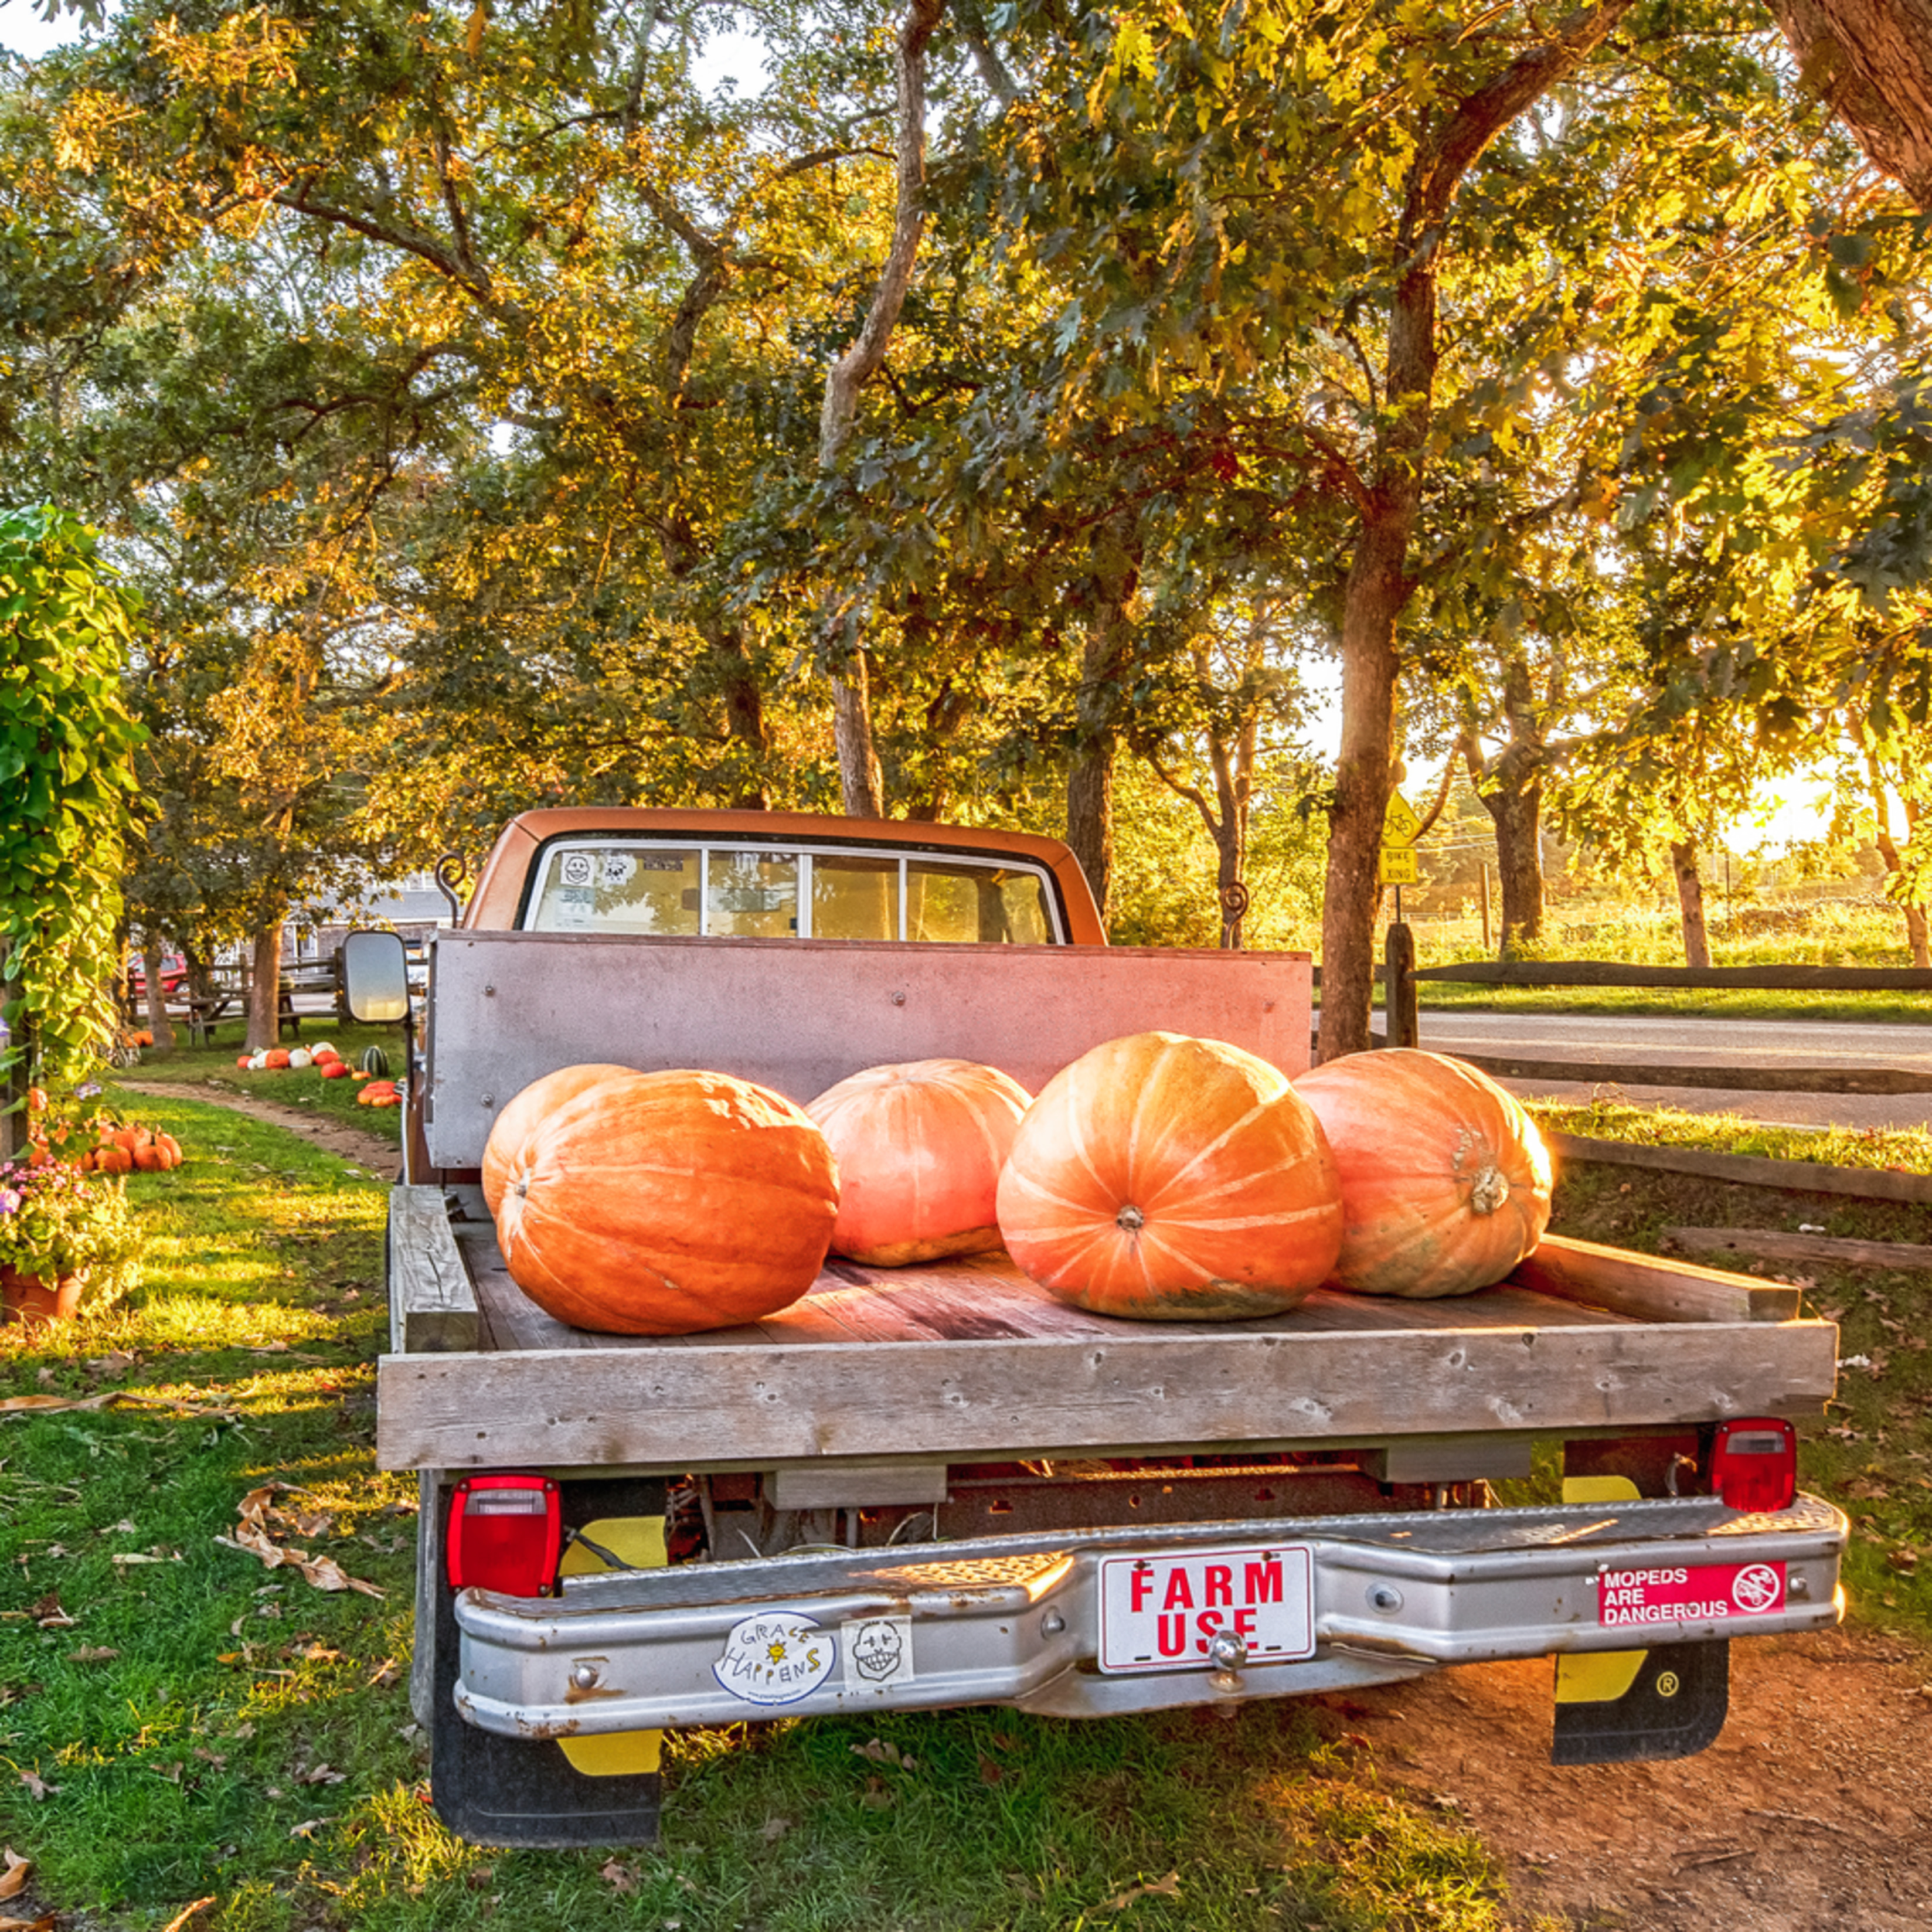 Morning glory fall farm l78unk